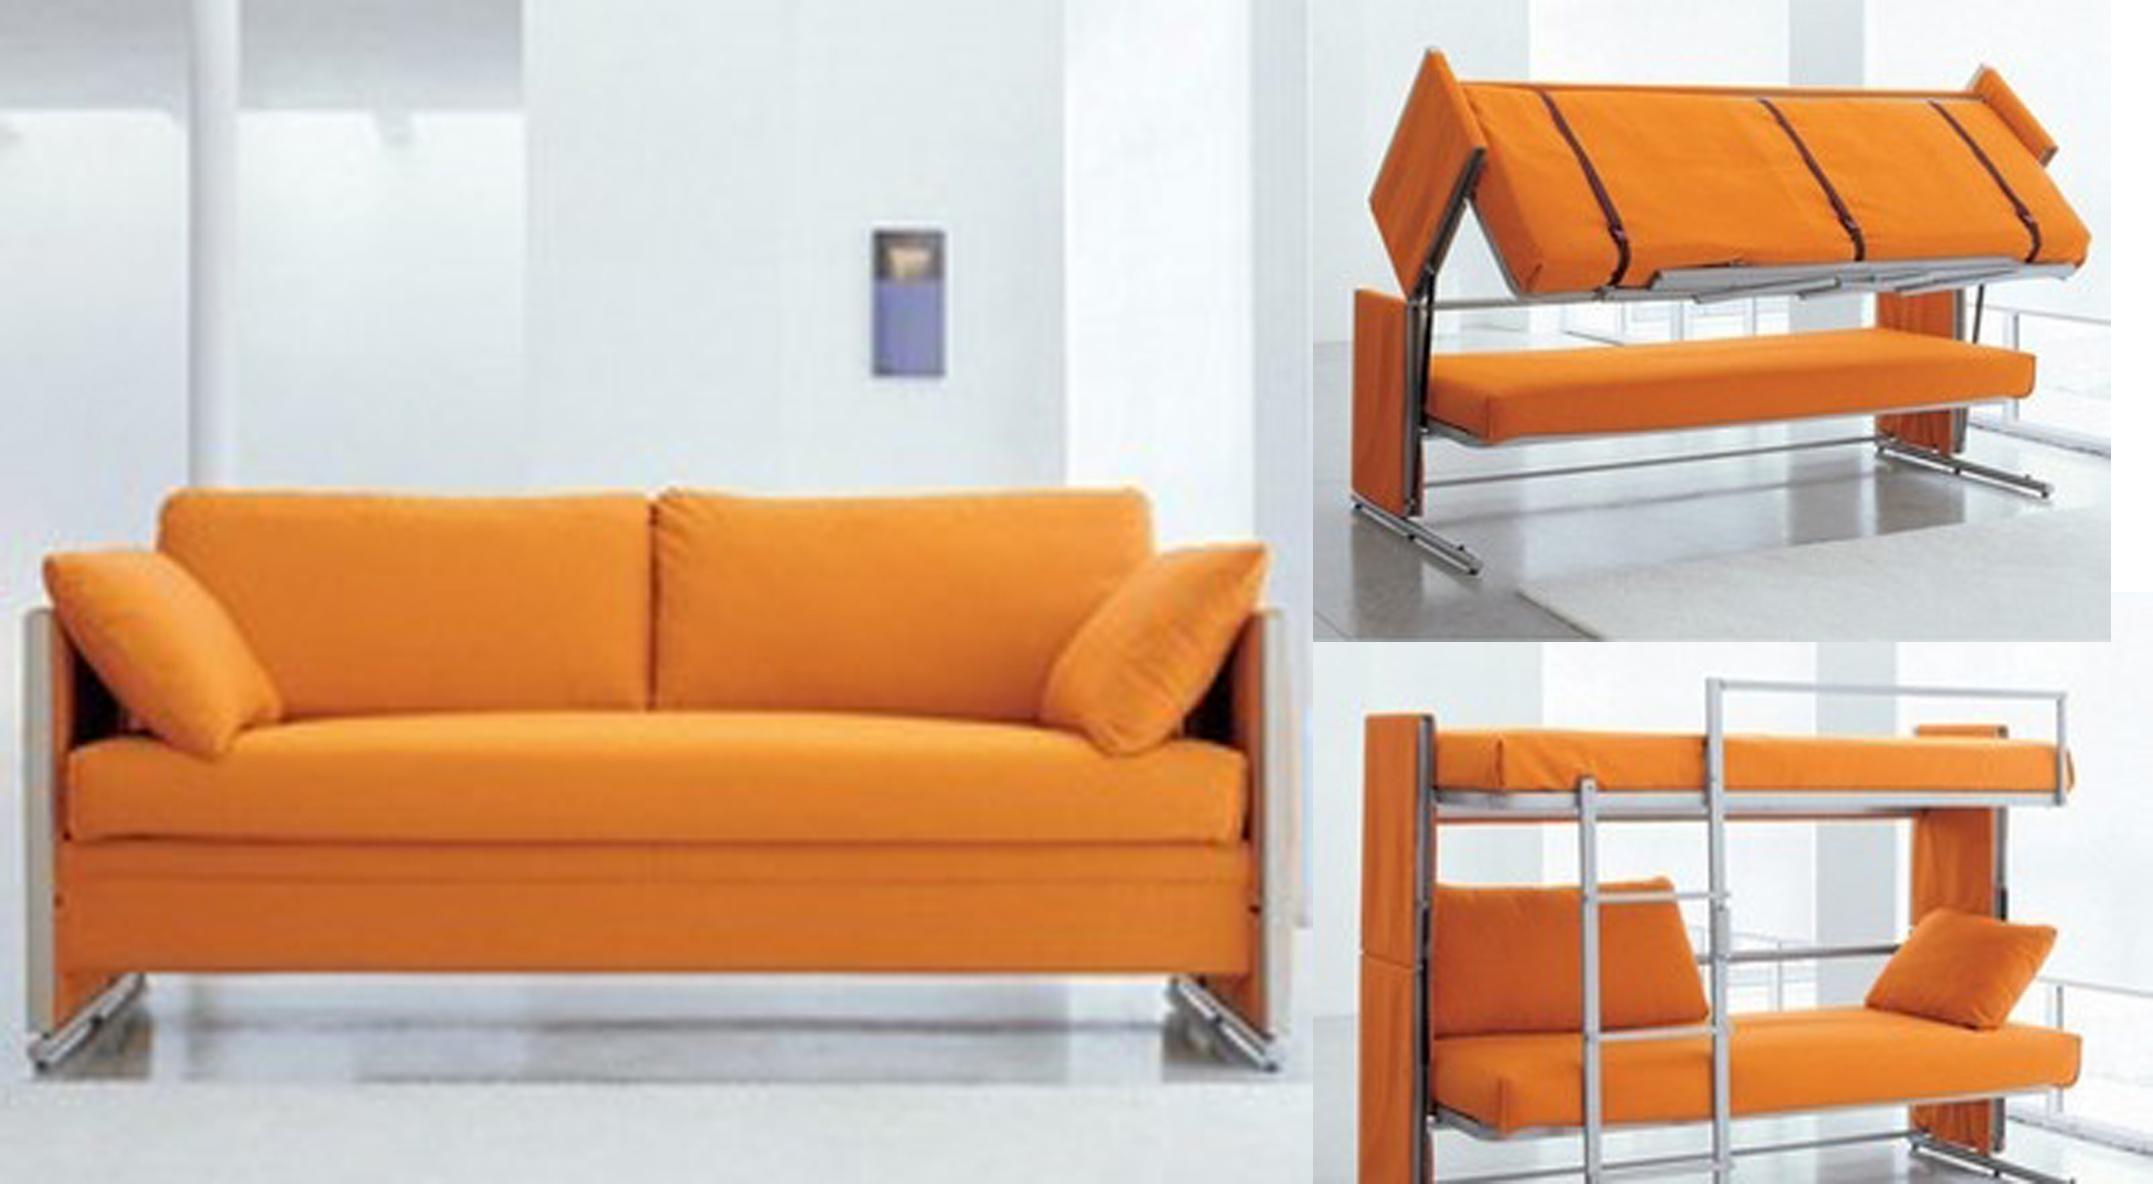 Amusing Sofa Bunk Bed Pics Inspiration – Tikspor Inside Sofa Bunk Beds (View 13 of 20)